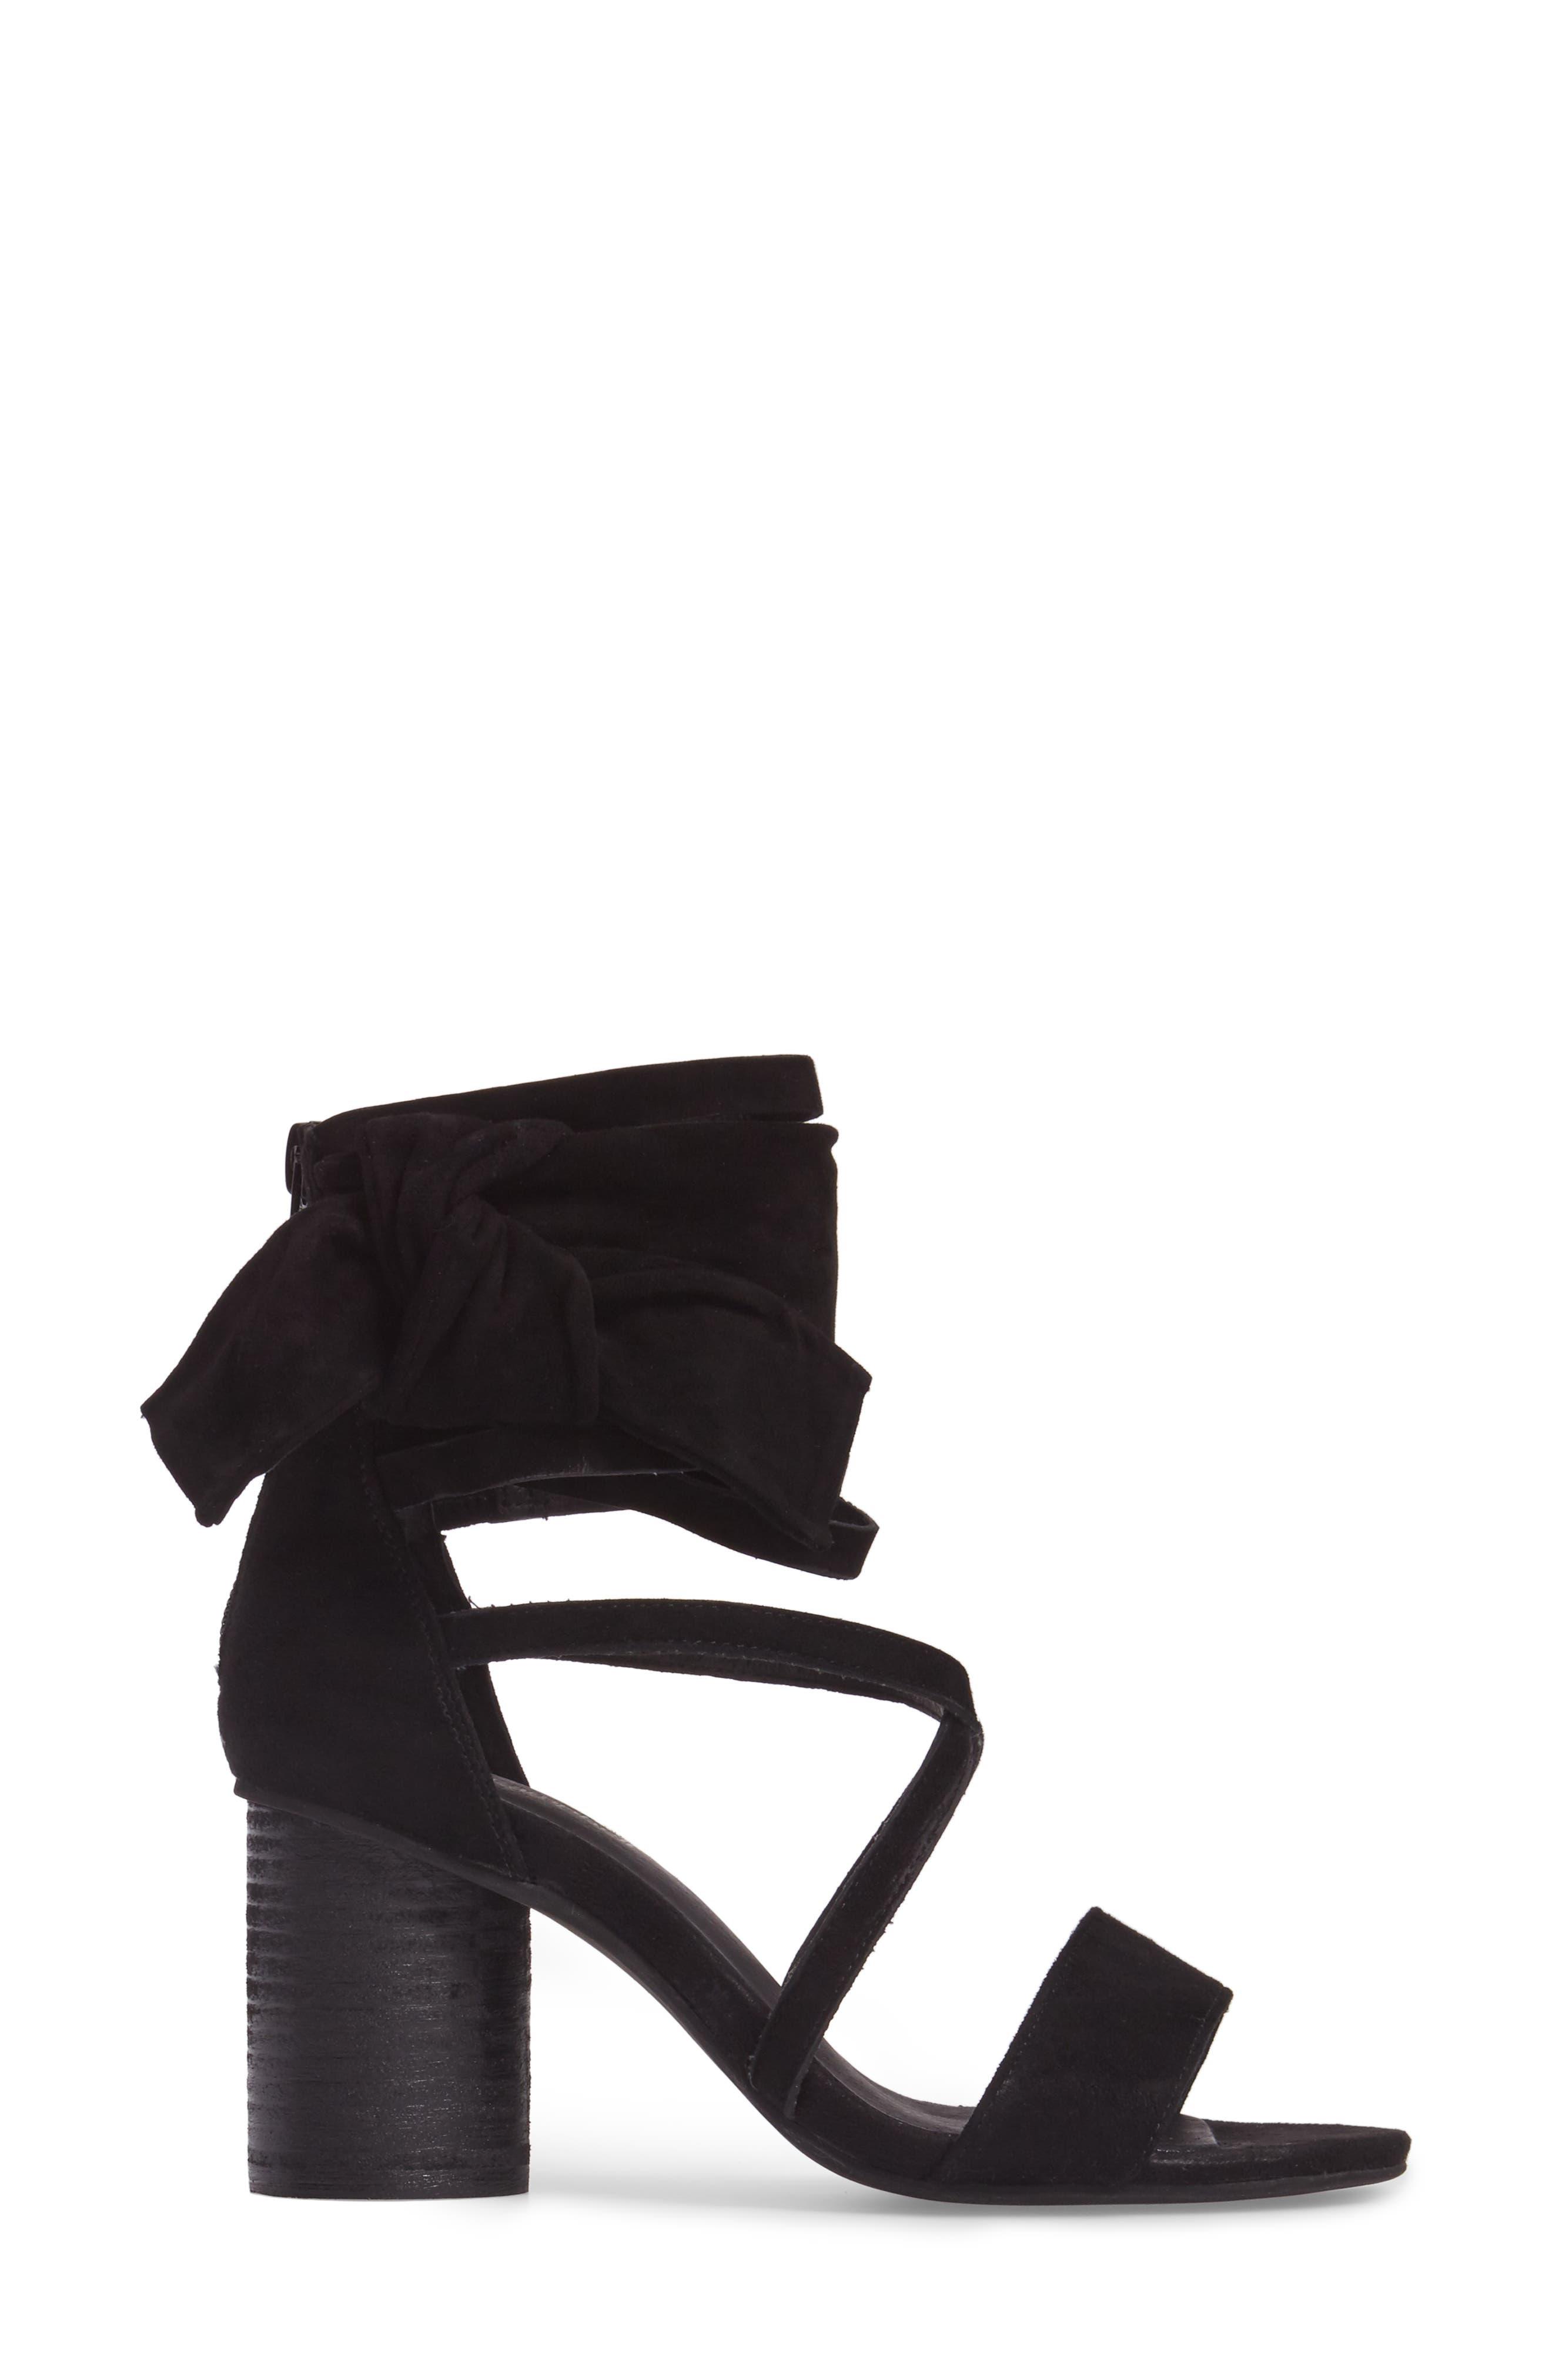 Destini Ankle Cuff Sandal,                             Alternate thumbnail 3, color,                             005